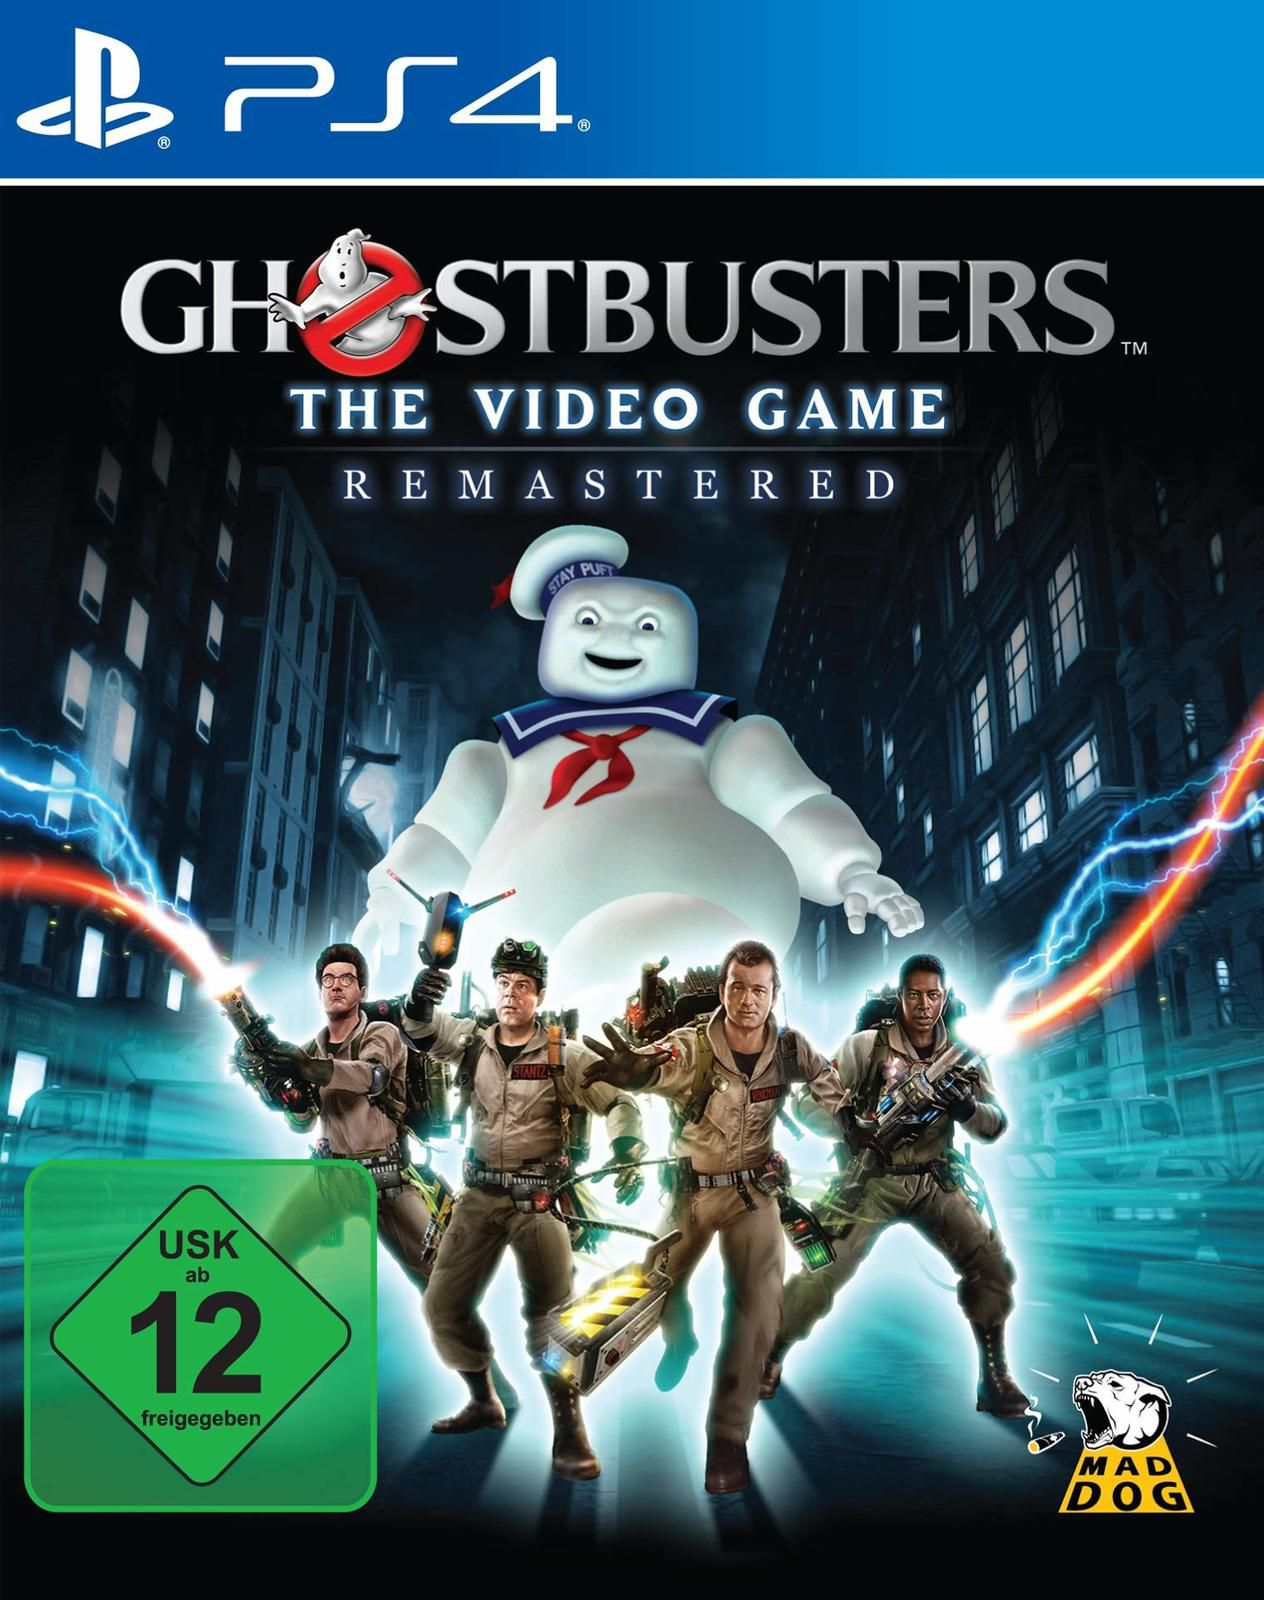 [TEST] GHOSTBUSTERS THE VIDEO GAME REMASTERED PS4 : les chasseurs de fantômes reviennent en HD